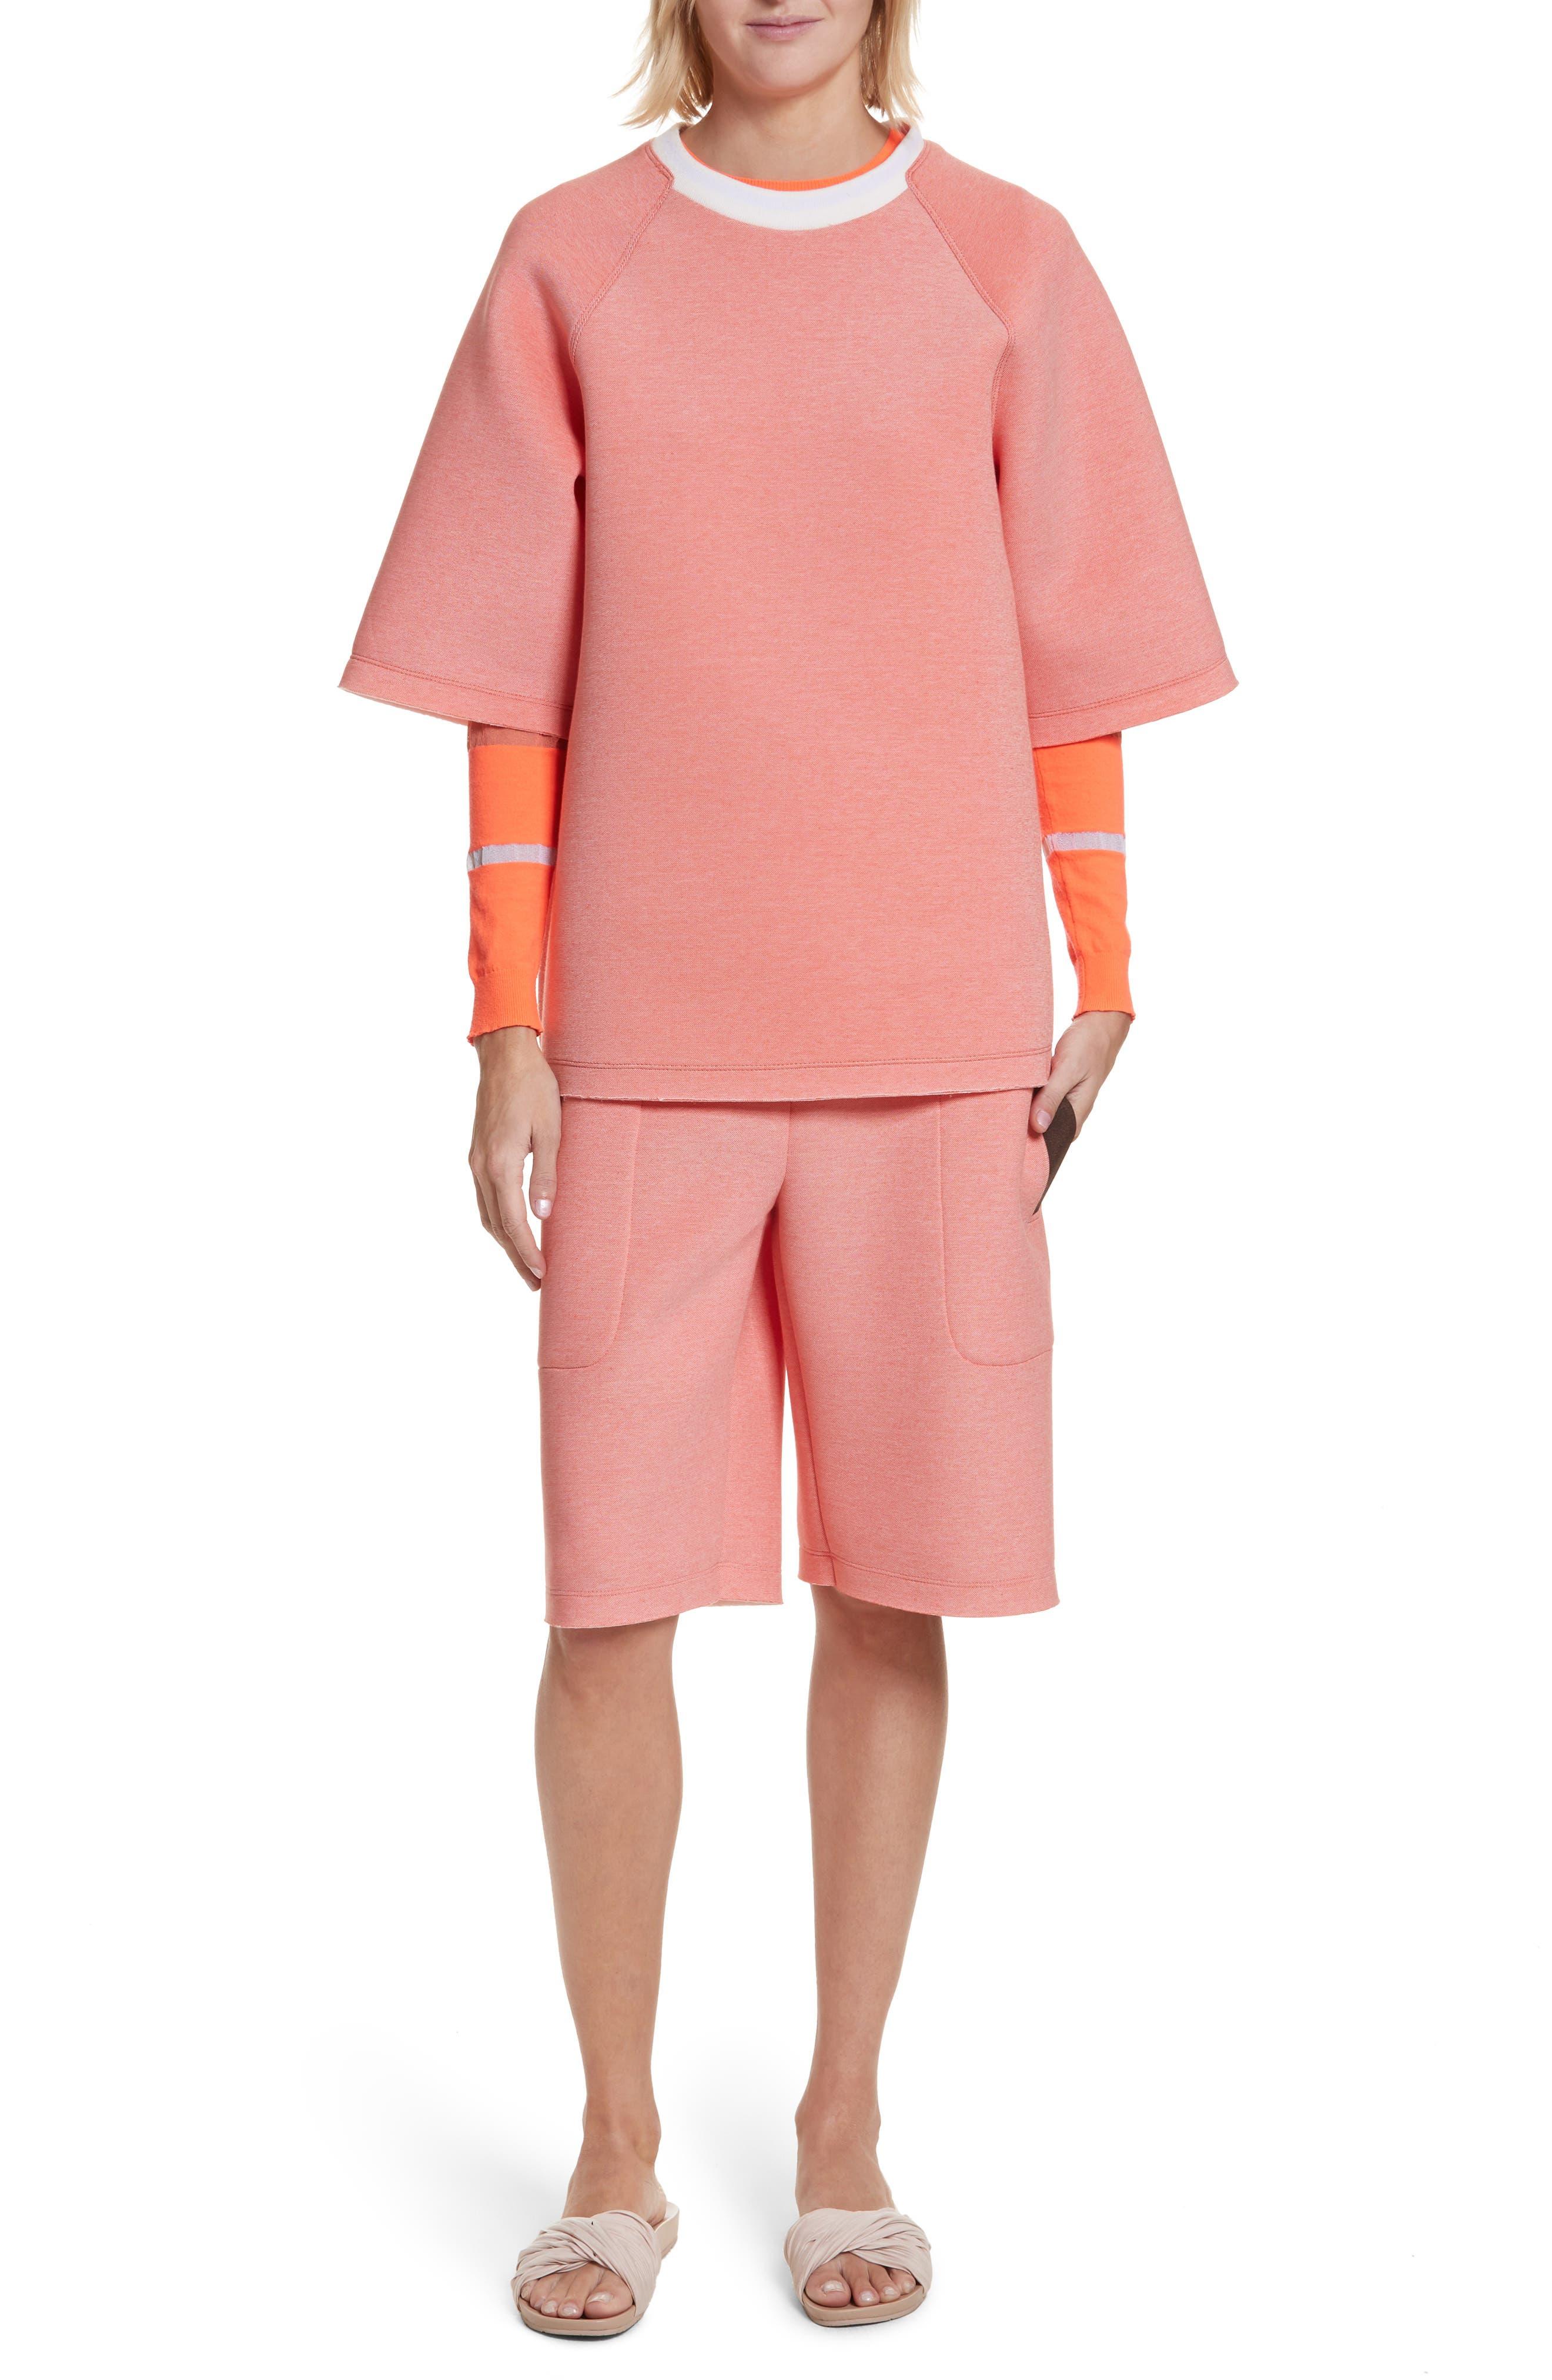 Tech Shorts,                             Alternate thumbnail 8, color,                             Coral